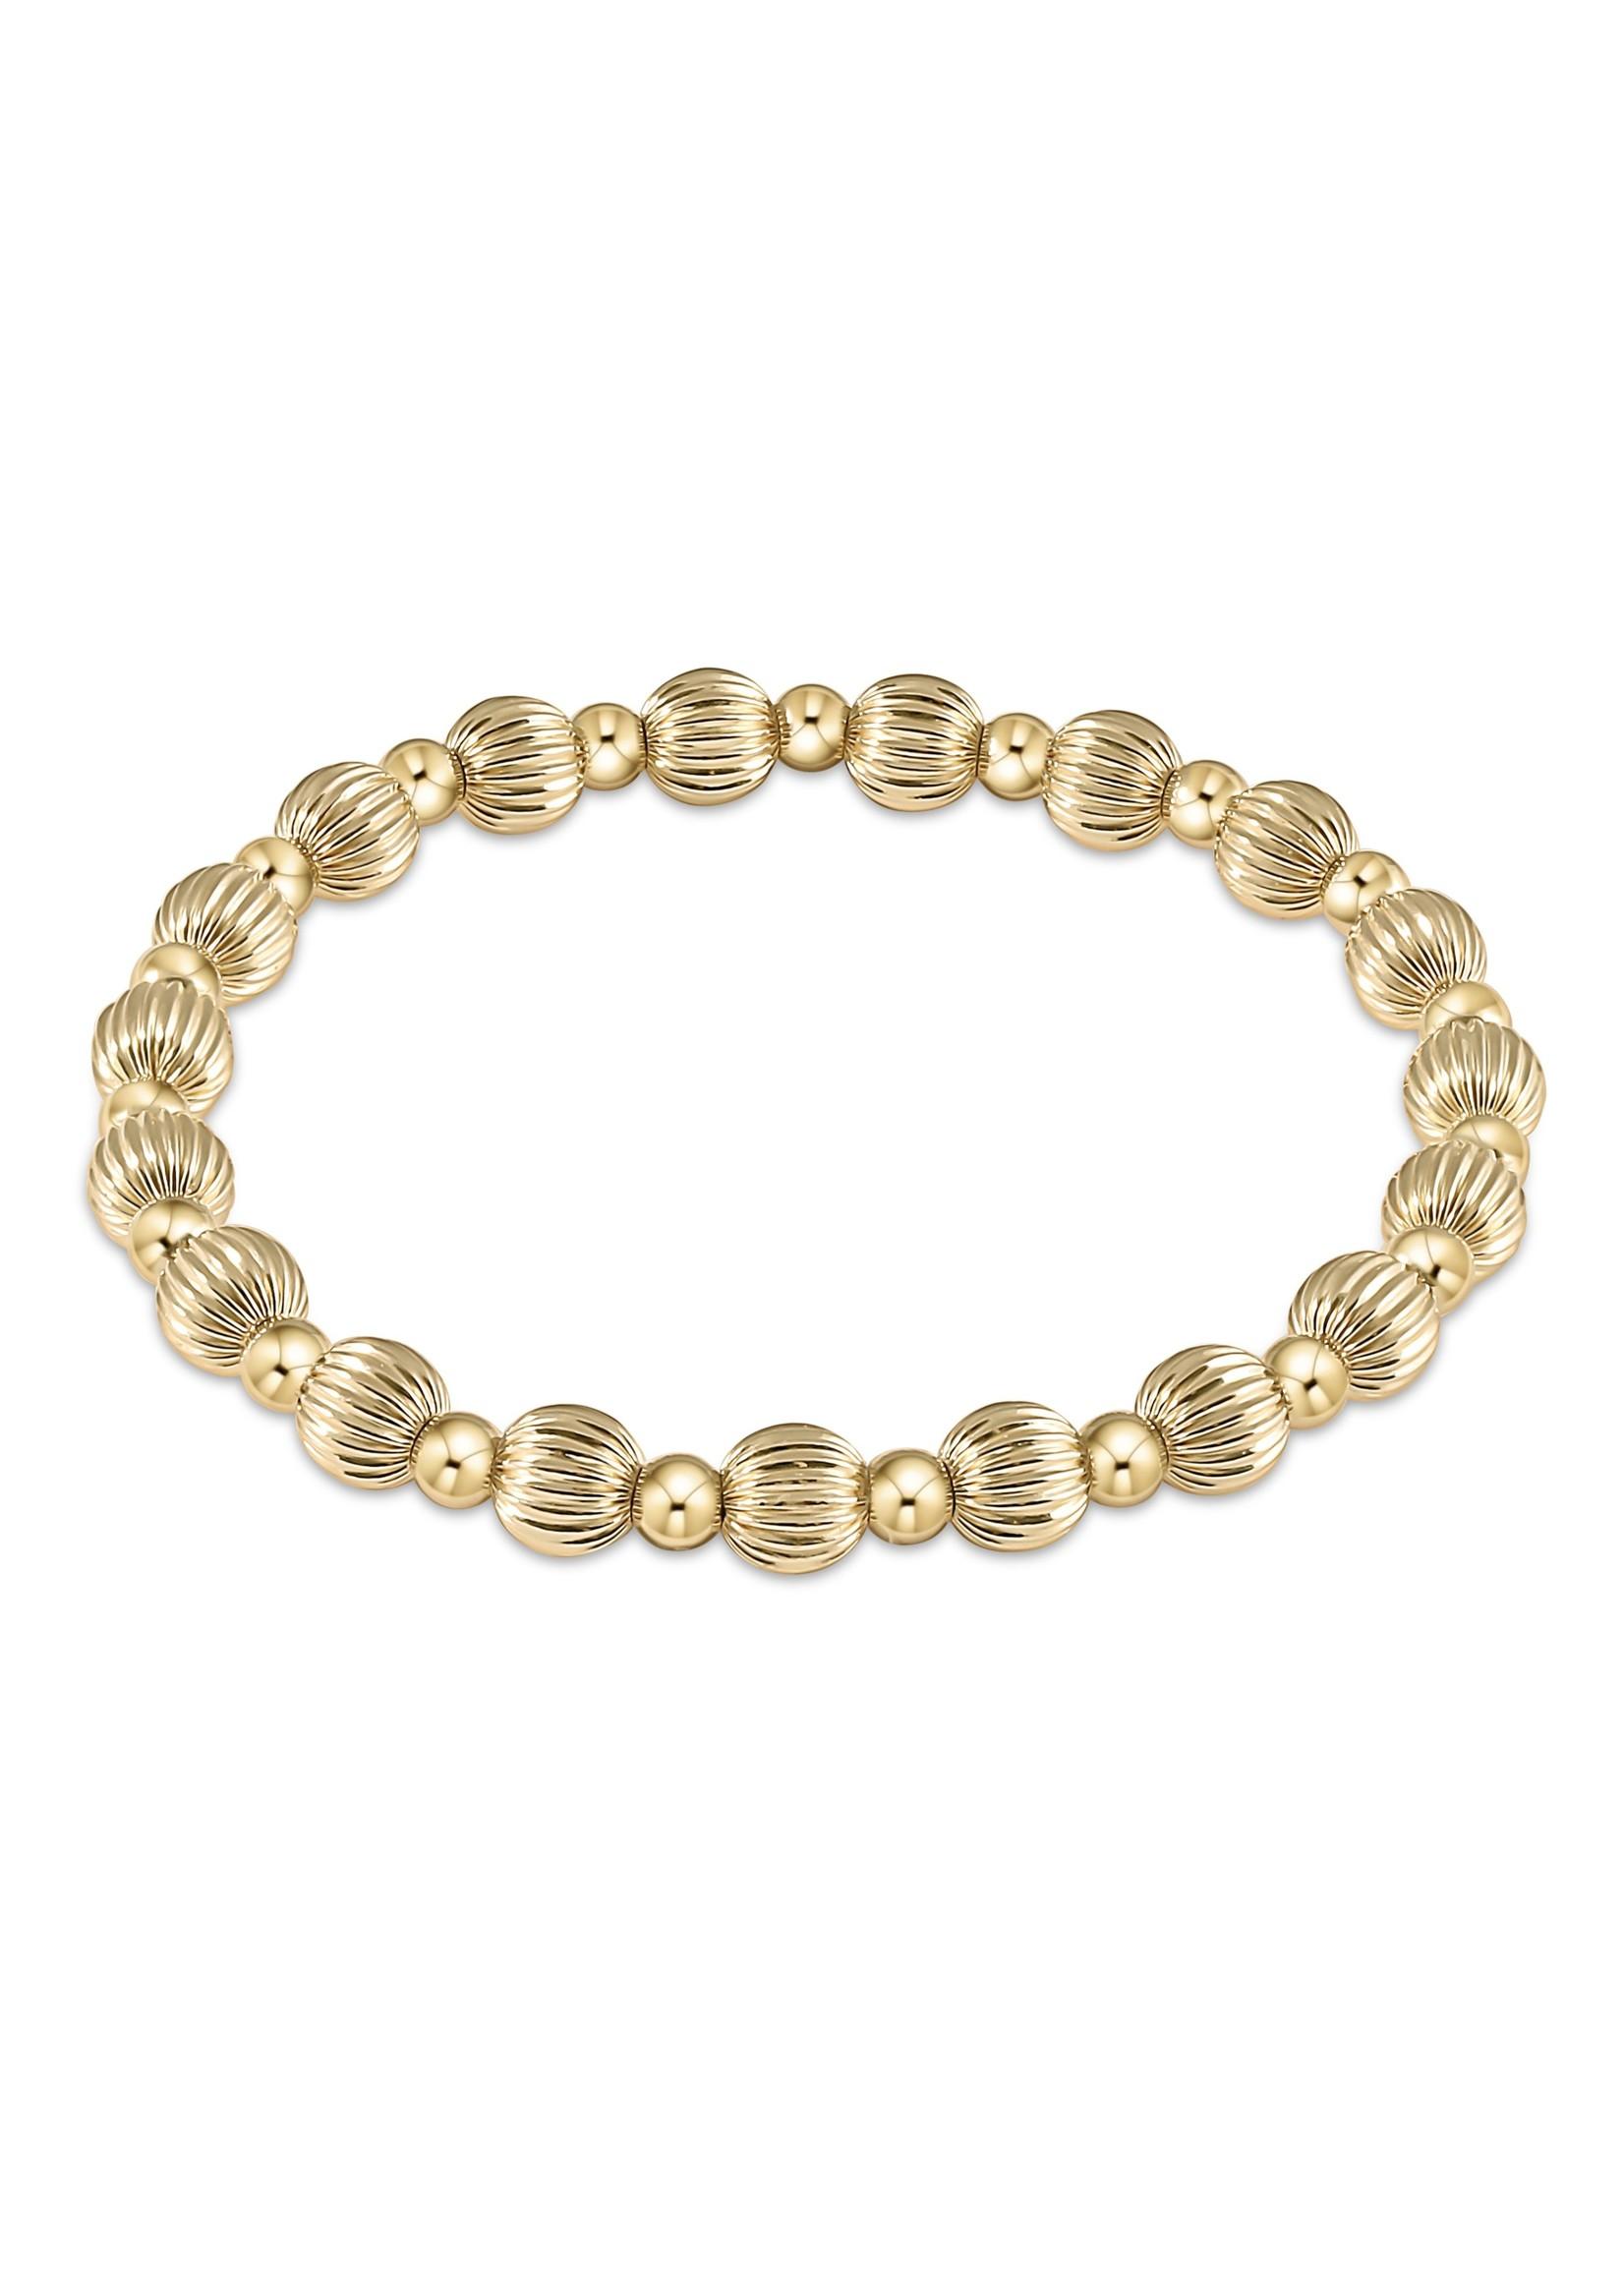 enewton Classic Grateful Pattern 6mm Bead Bracelet - Gold